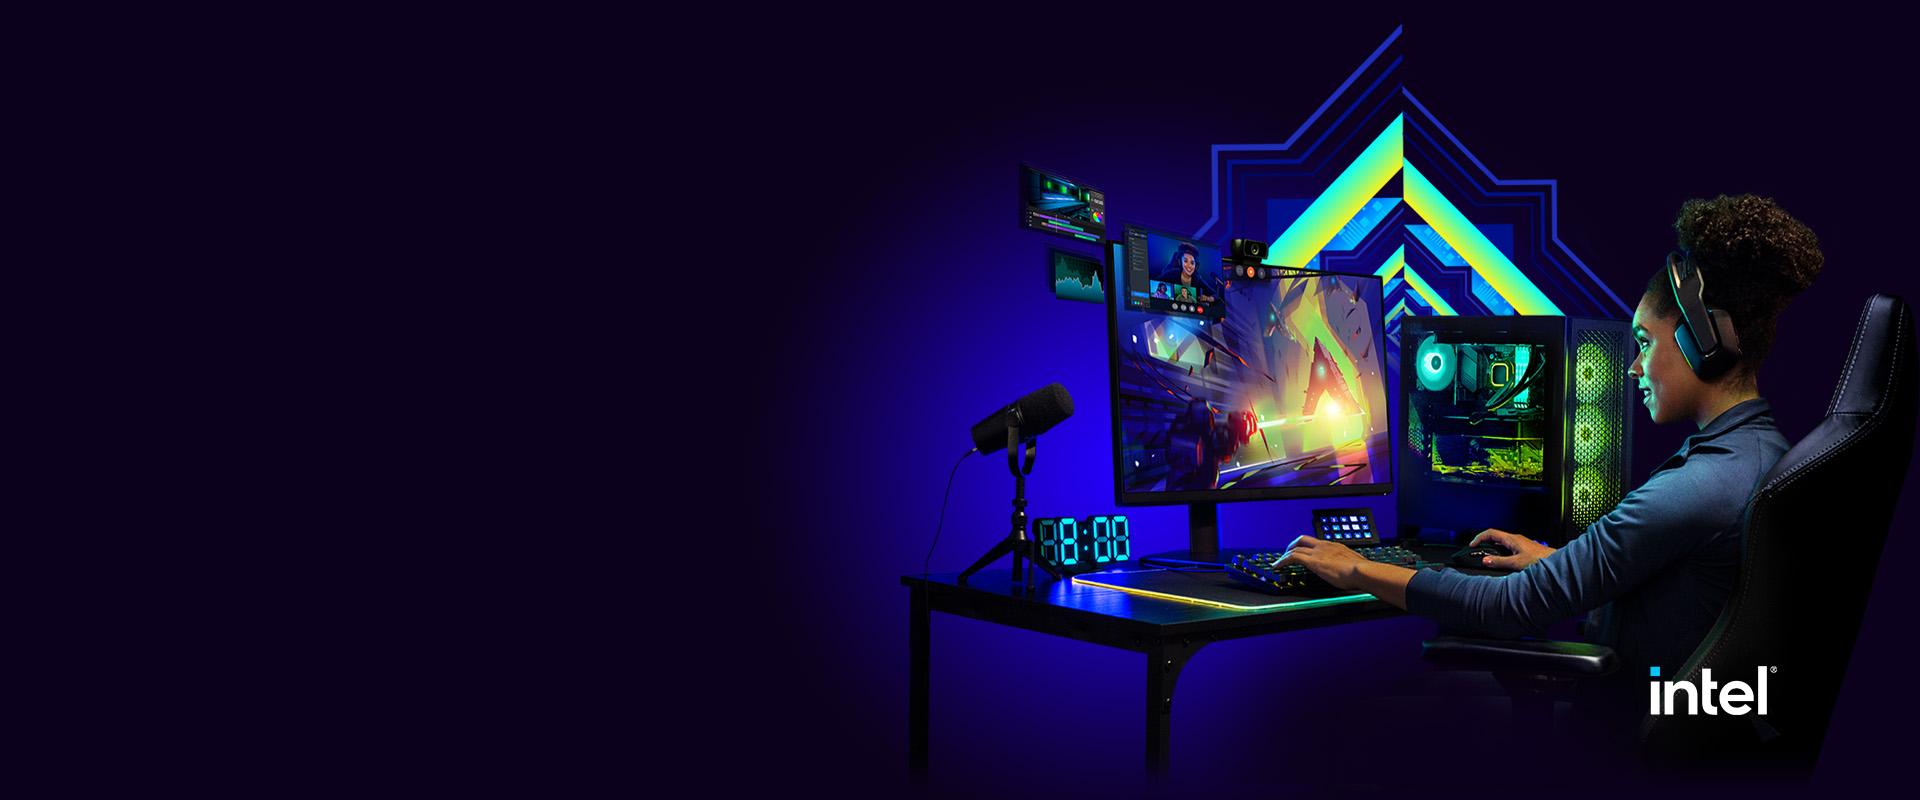 Intel 12th Gen Alder Lake Now Available on Origin PC Desktops